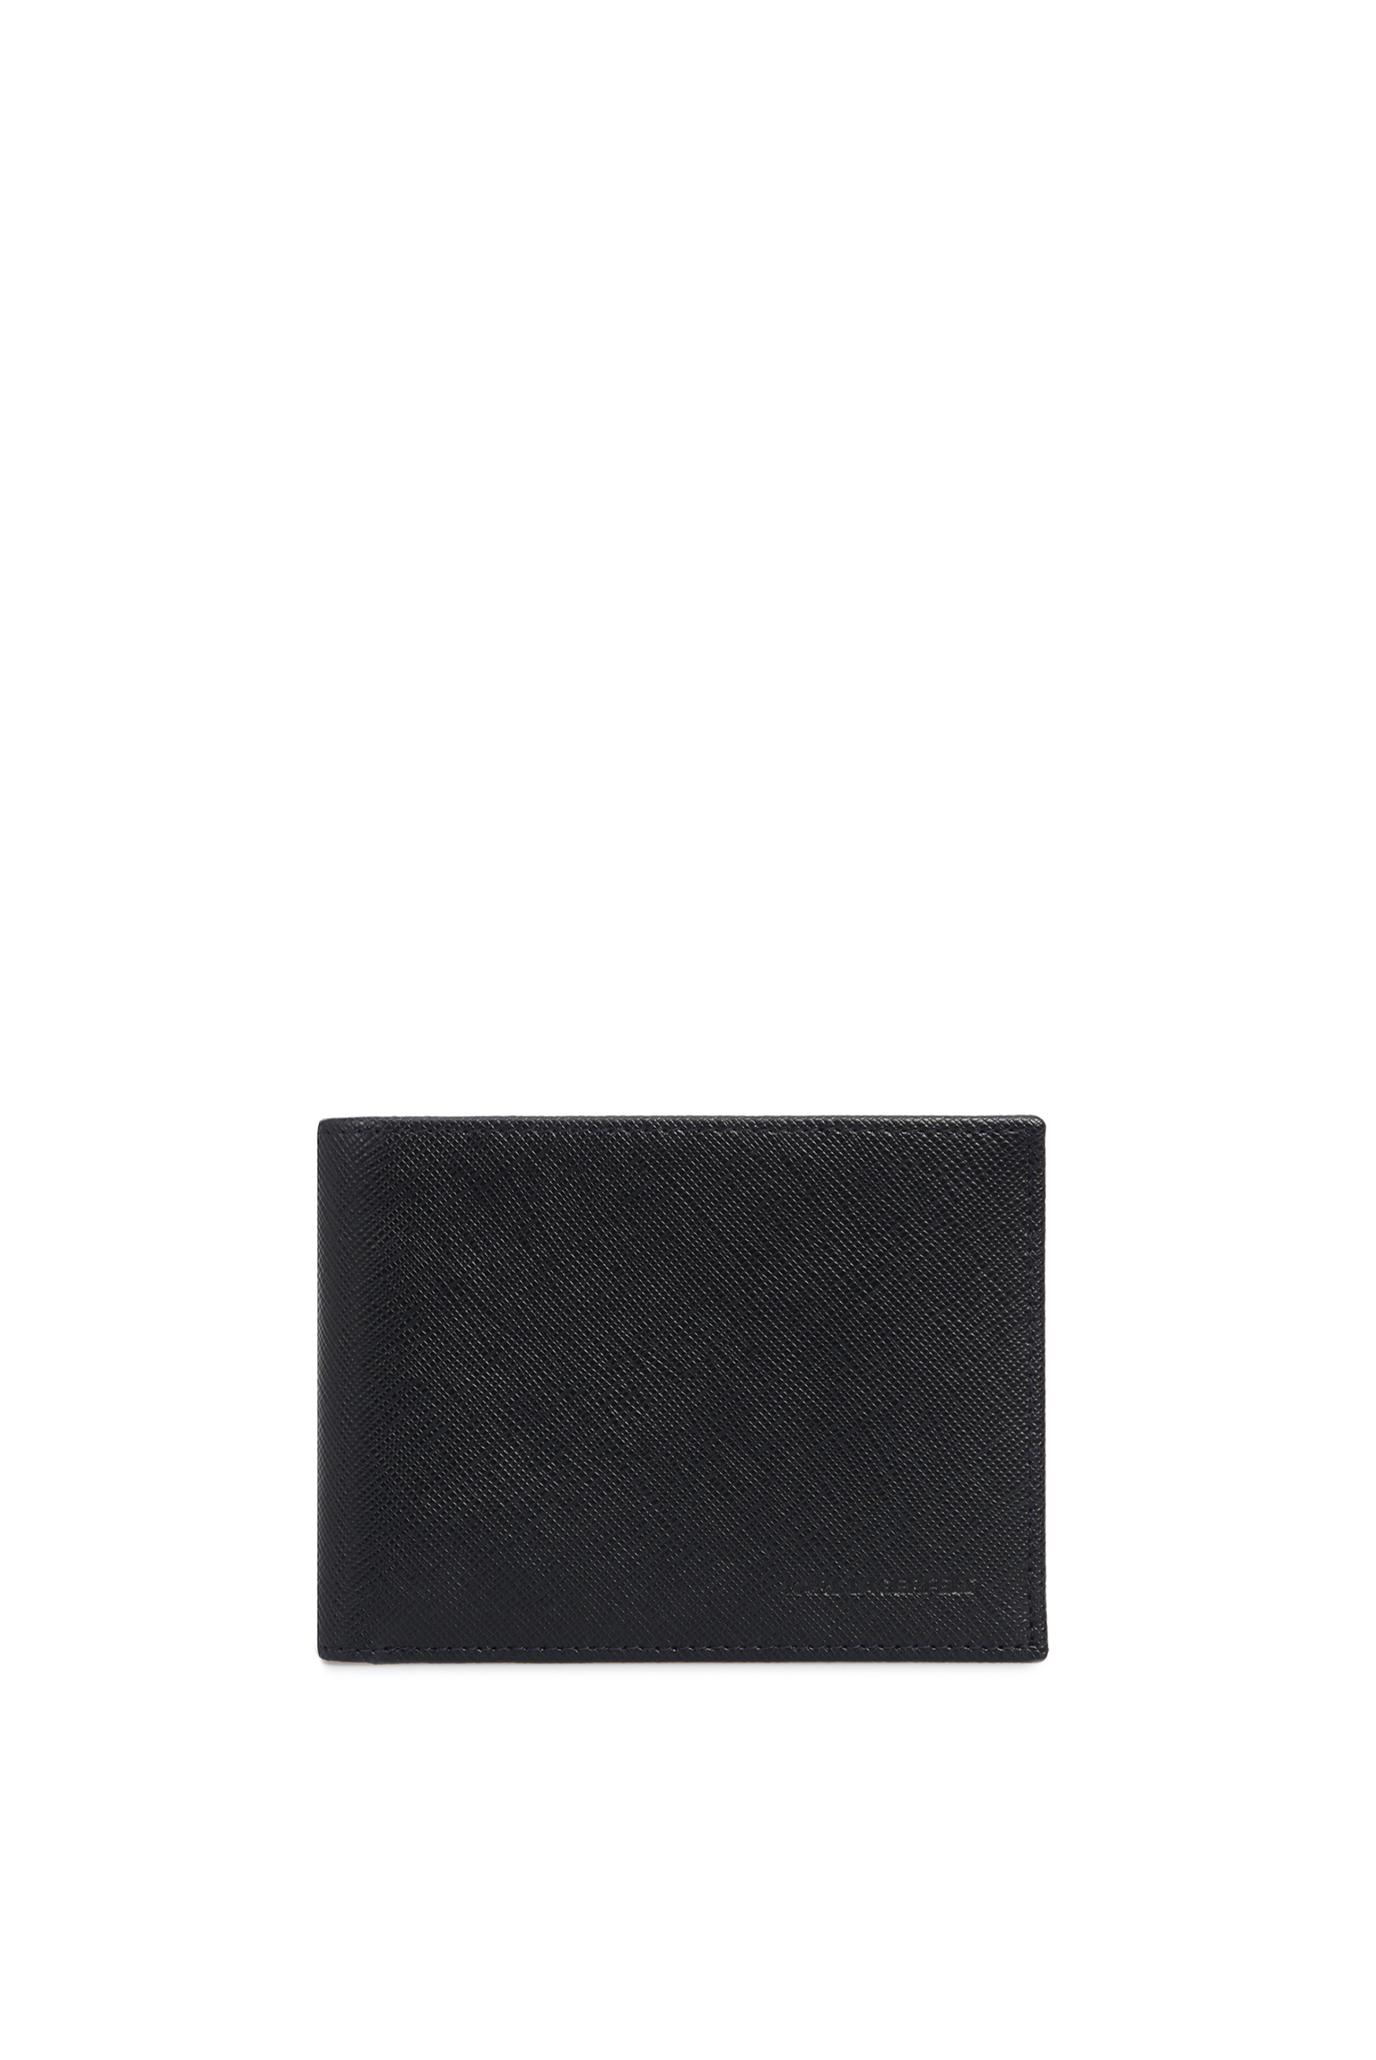 Мужской синий кожаный кошелек Karl Lagerfeld 592461.815417;690